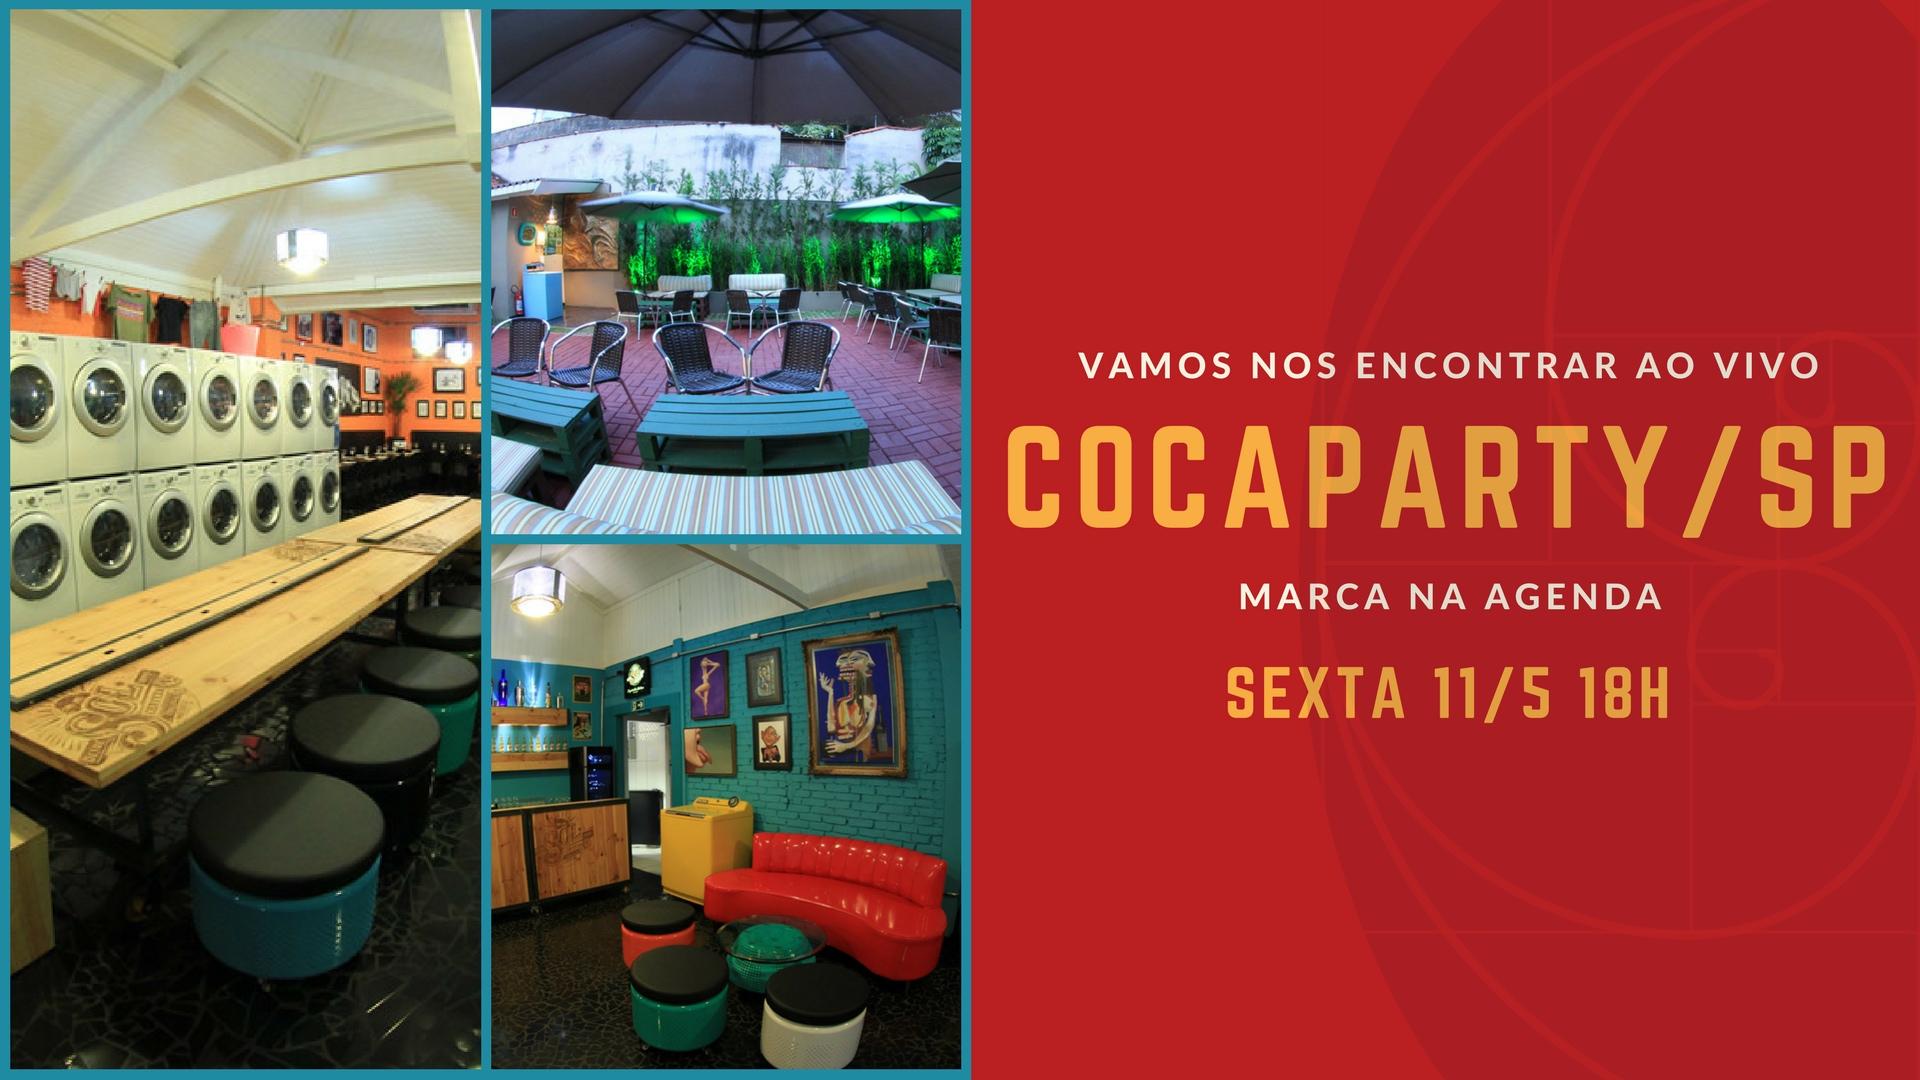 CocaParty/SP'18